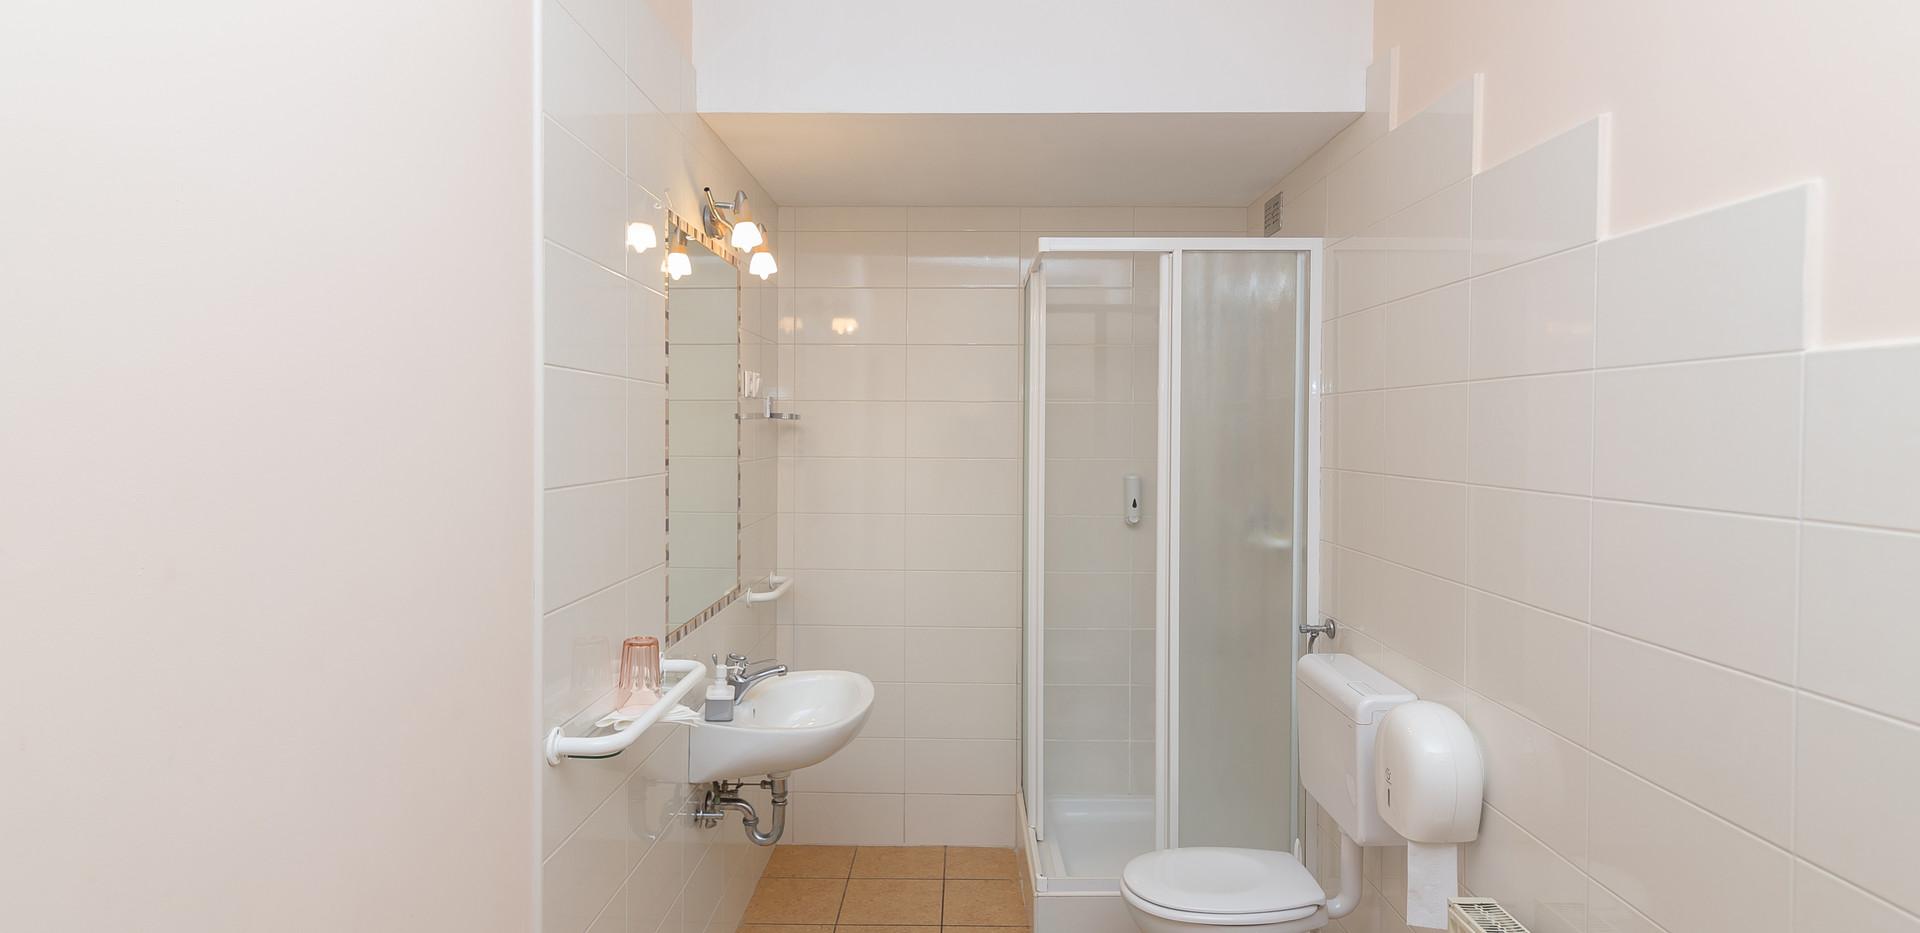 C-401-bathroom_1746.jpg